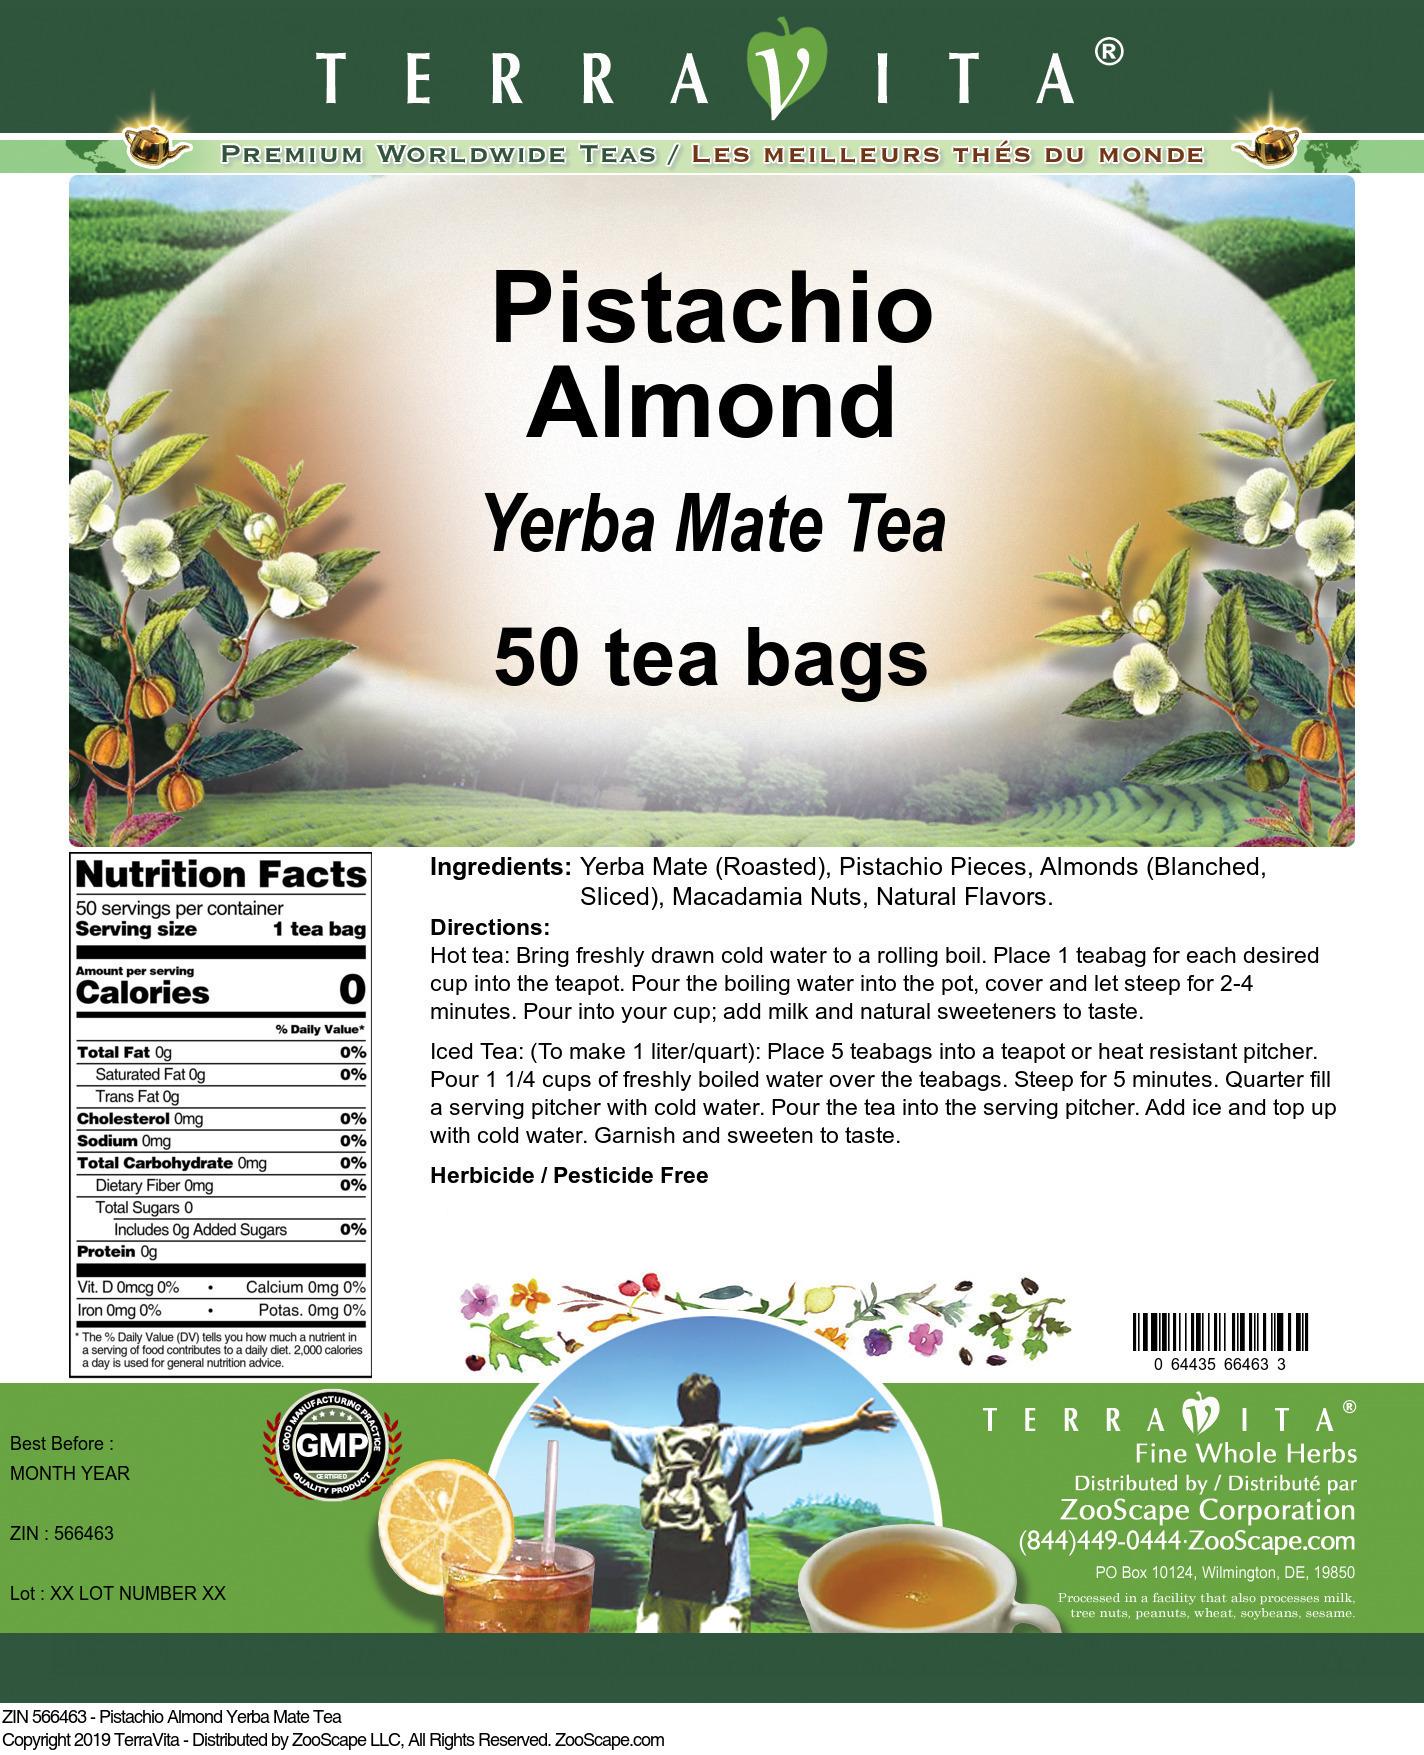 Pistachio Almond Yerba Mate Tea